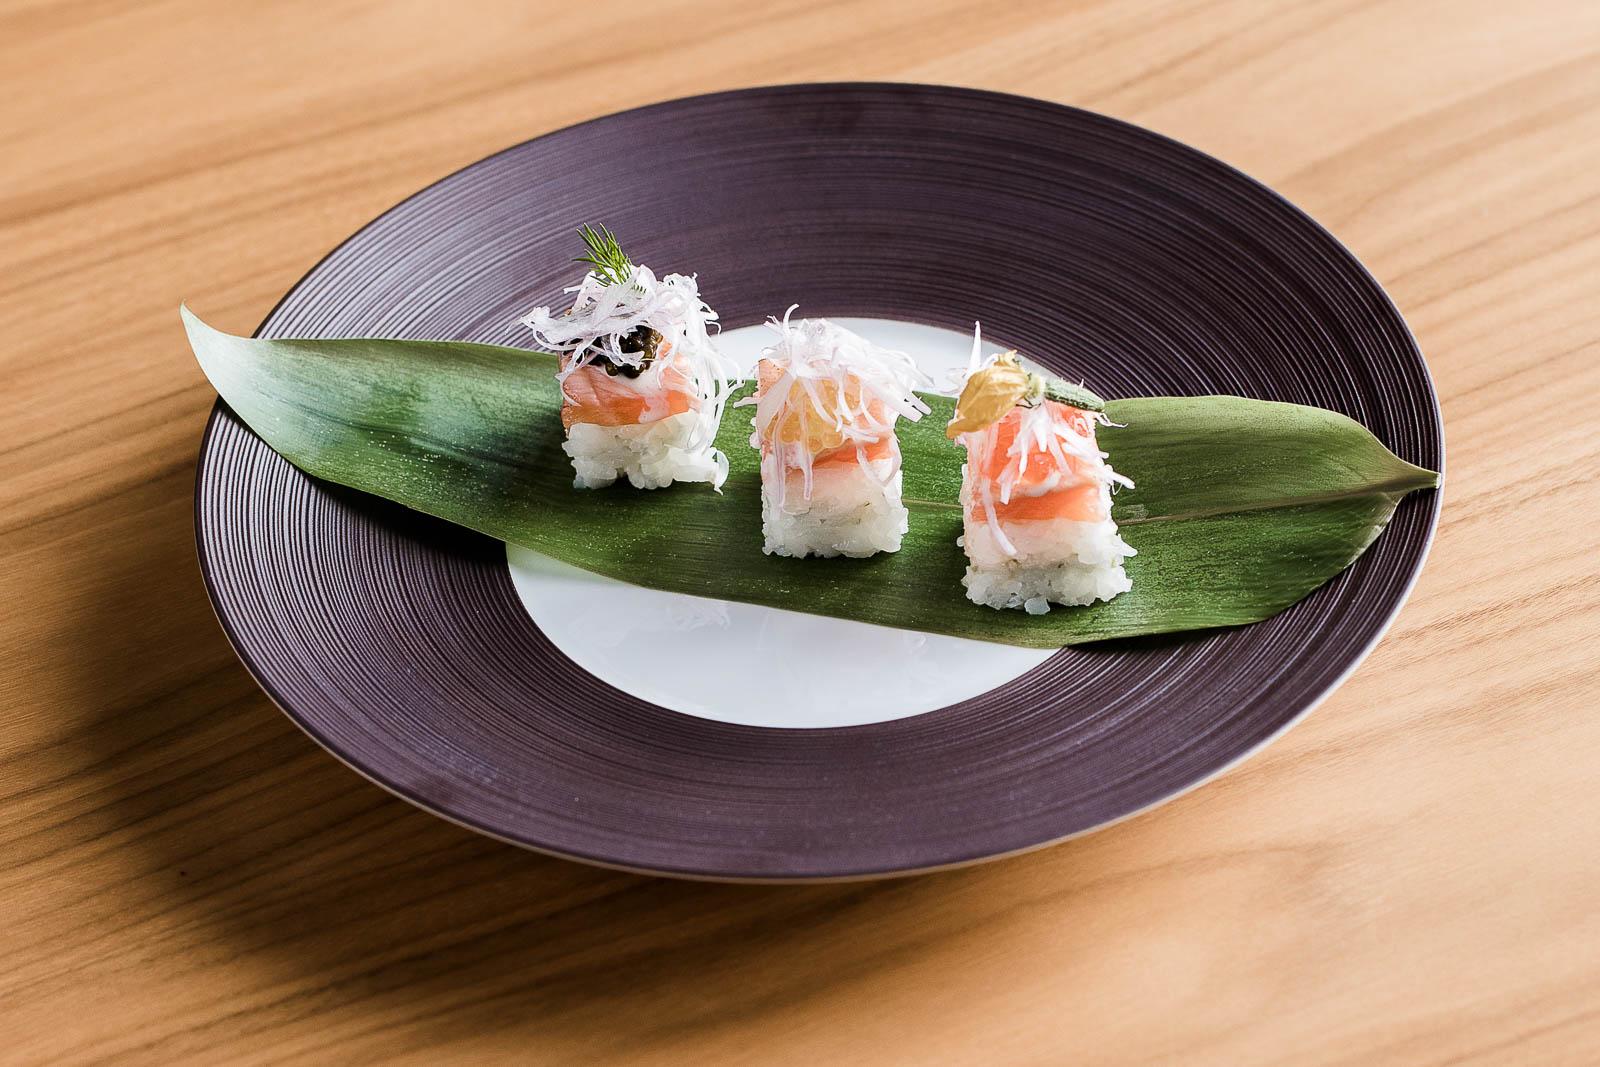 The Chedi sushi